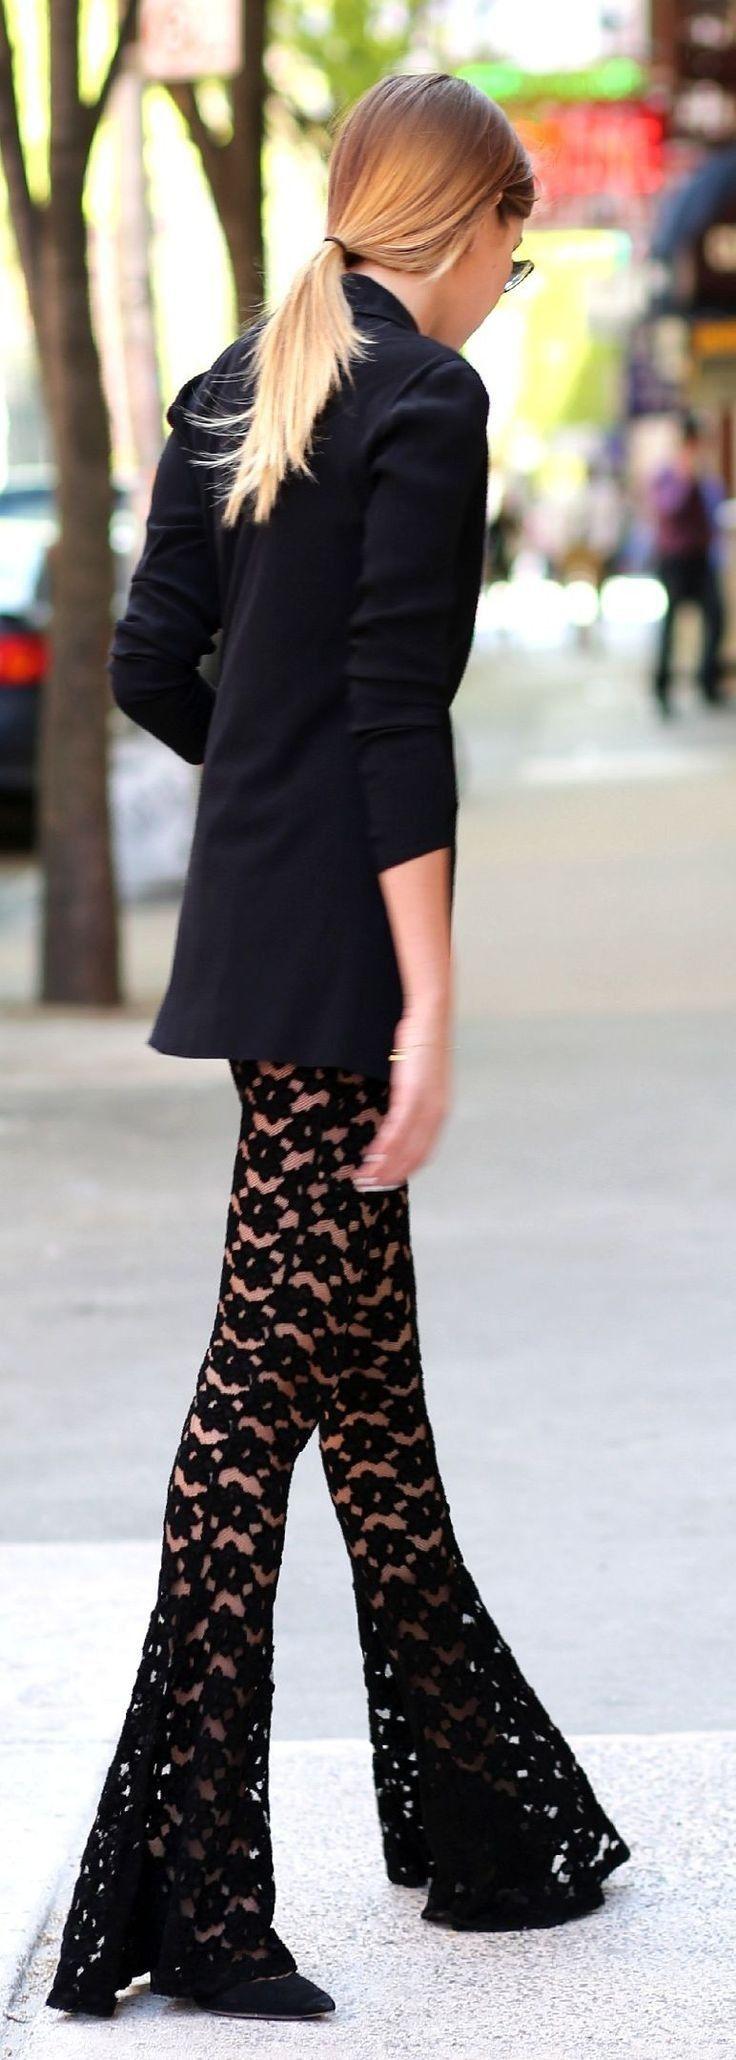 #summer #boho #style #outfitideas |Black Eyelet Geometric Print Lace Bootcut Pants + Blazer